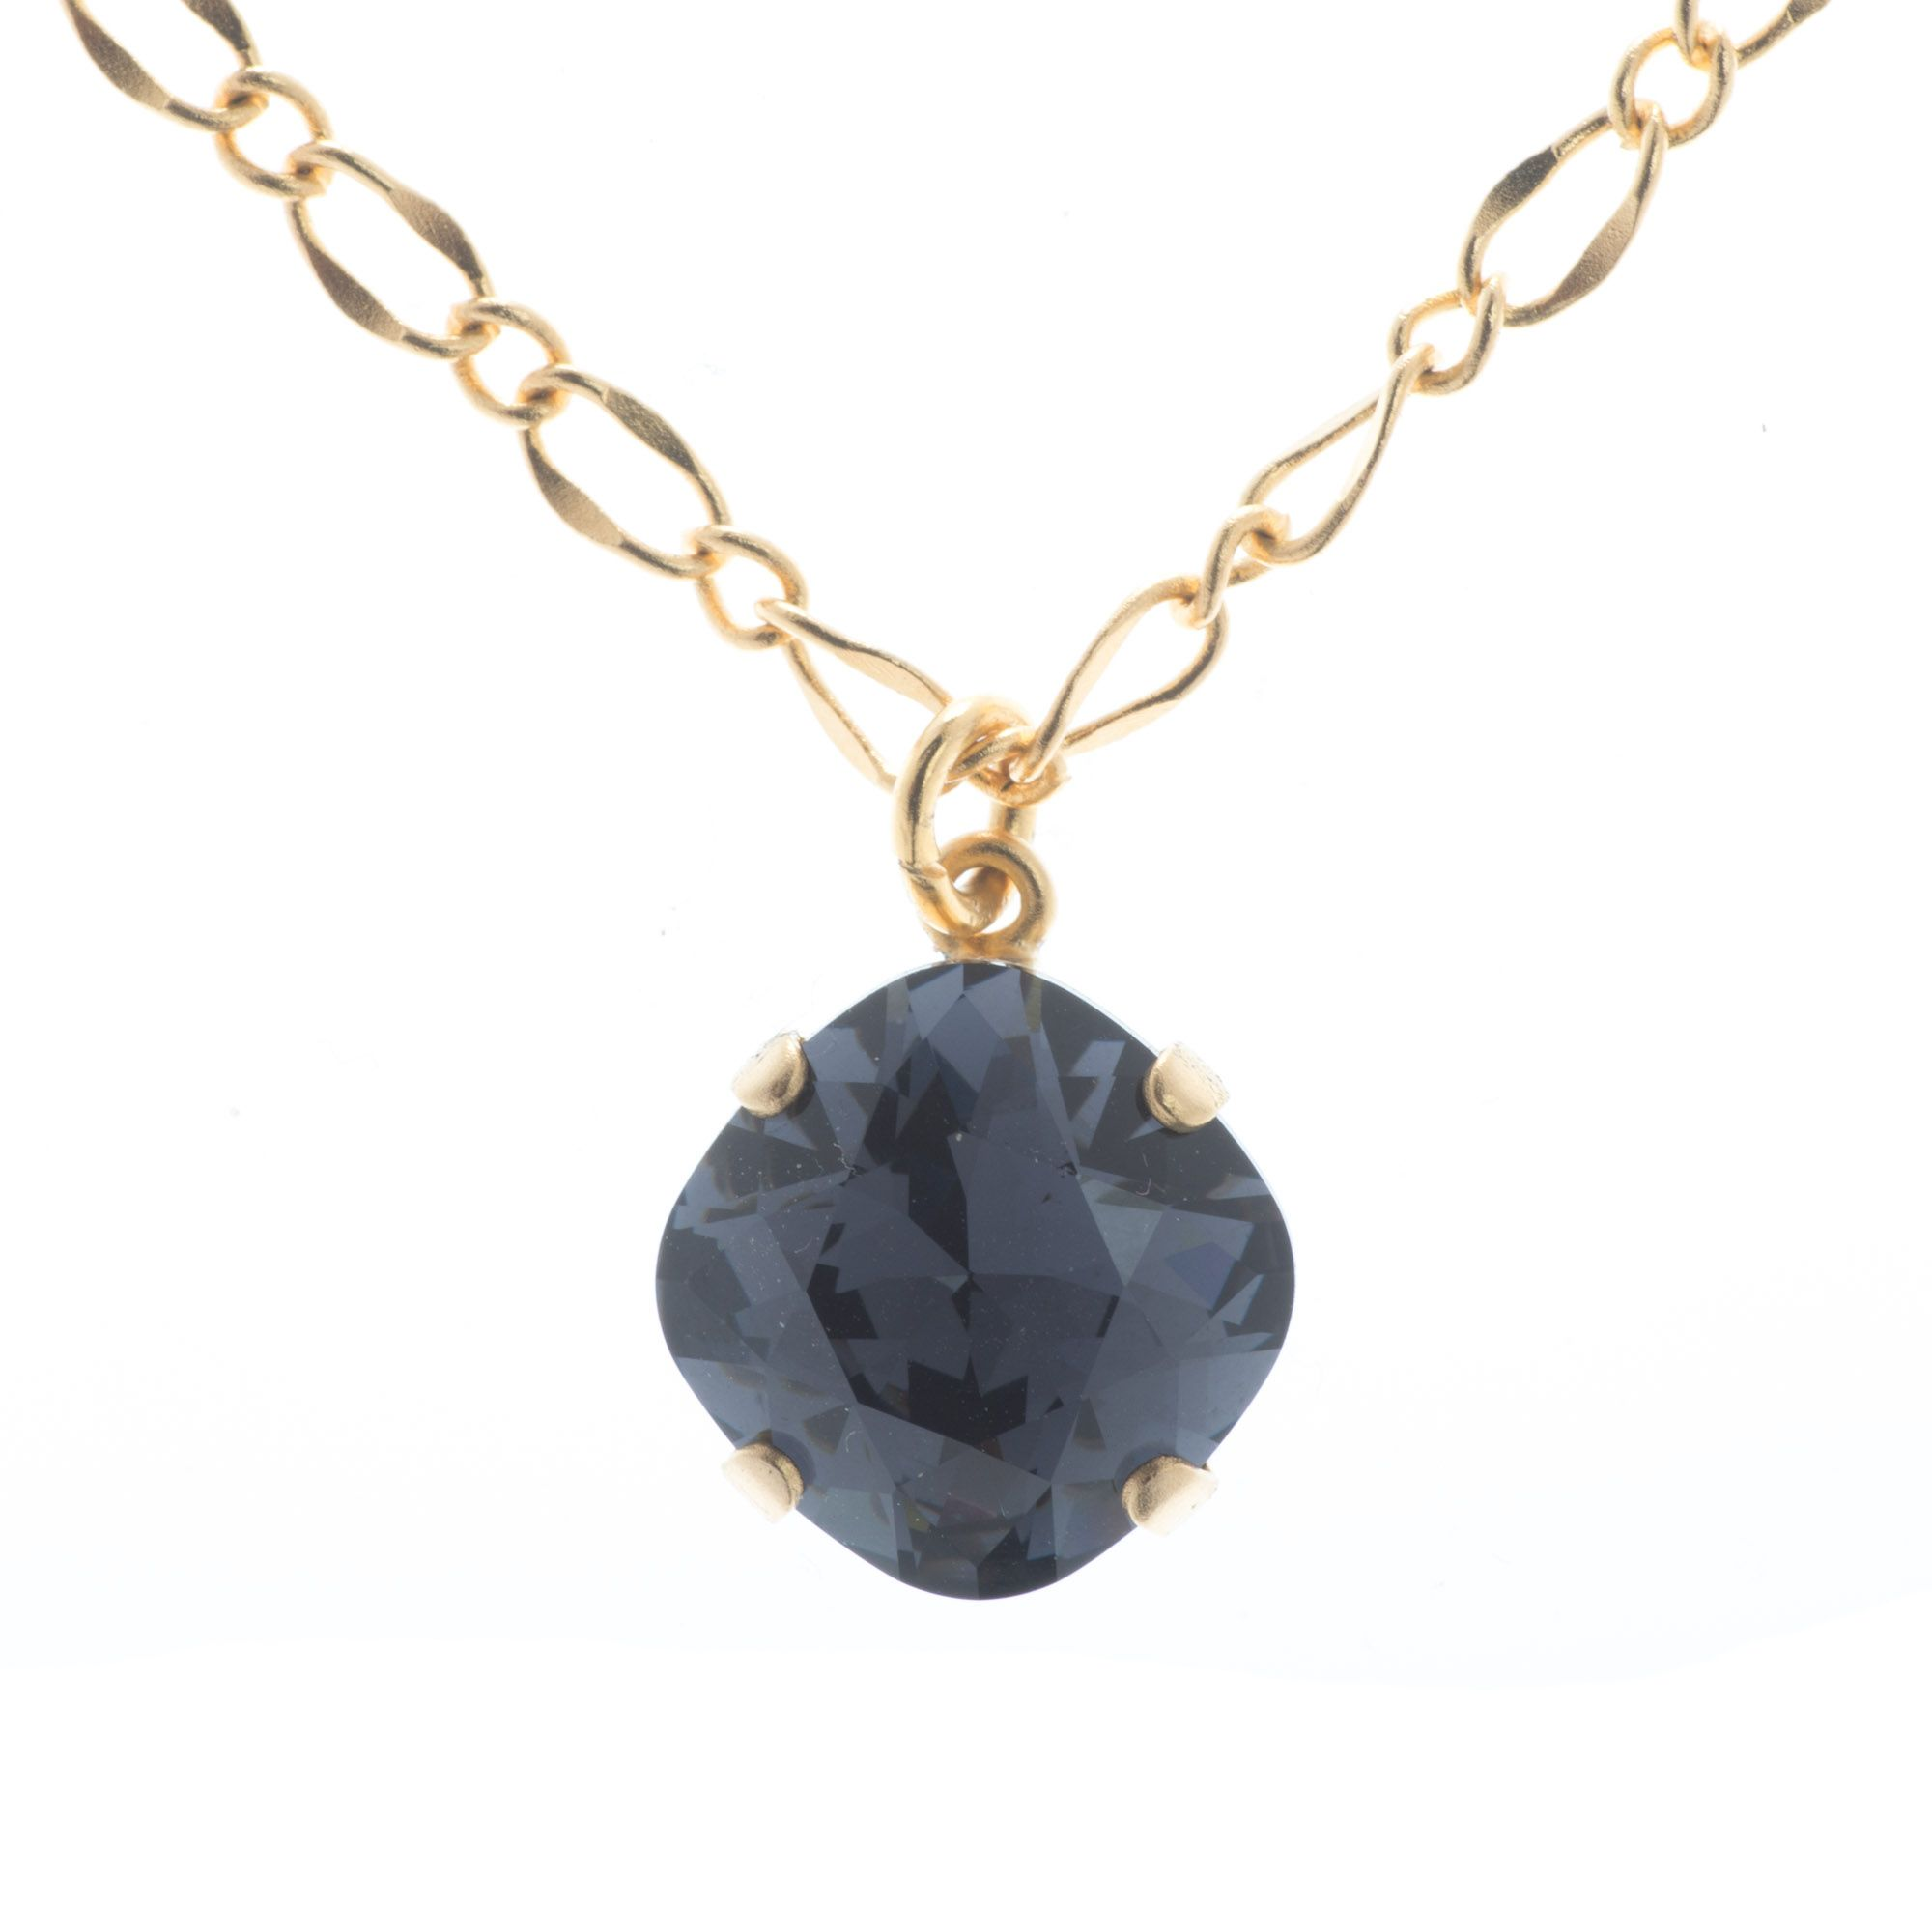 5cb6e69854256 Lisa Marie Jewelry 12mm Square Swarovski Crystal Pendant Necklace